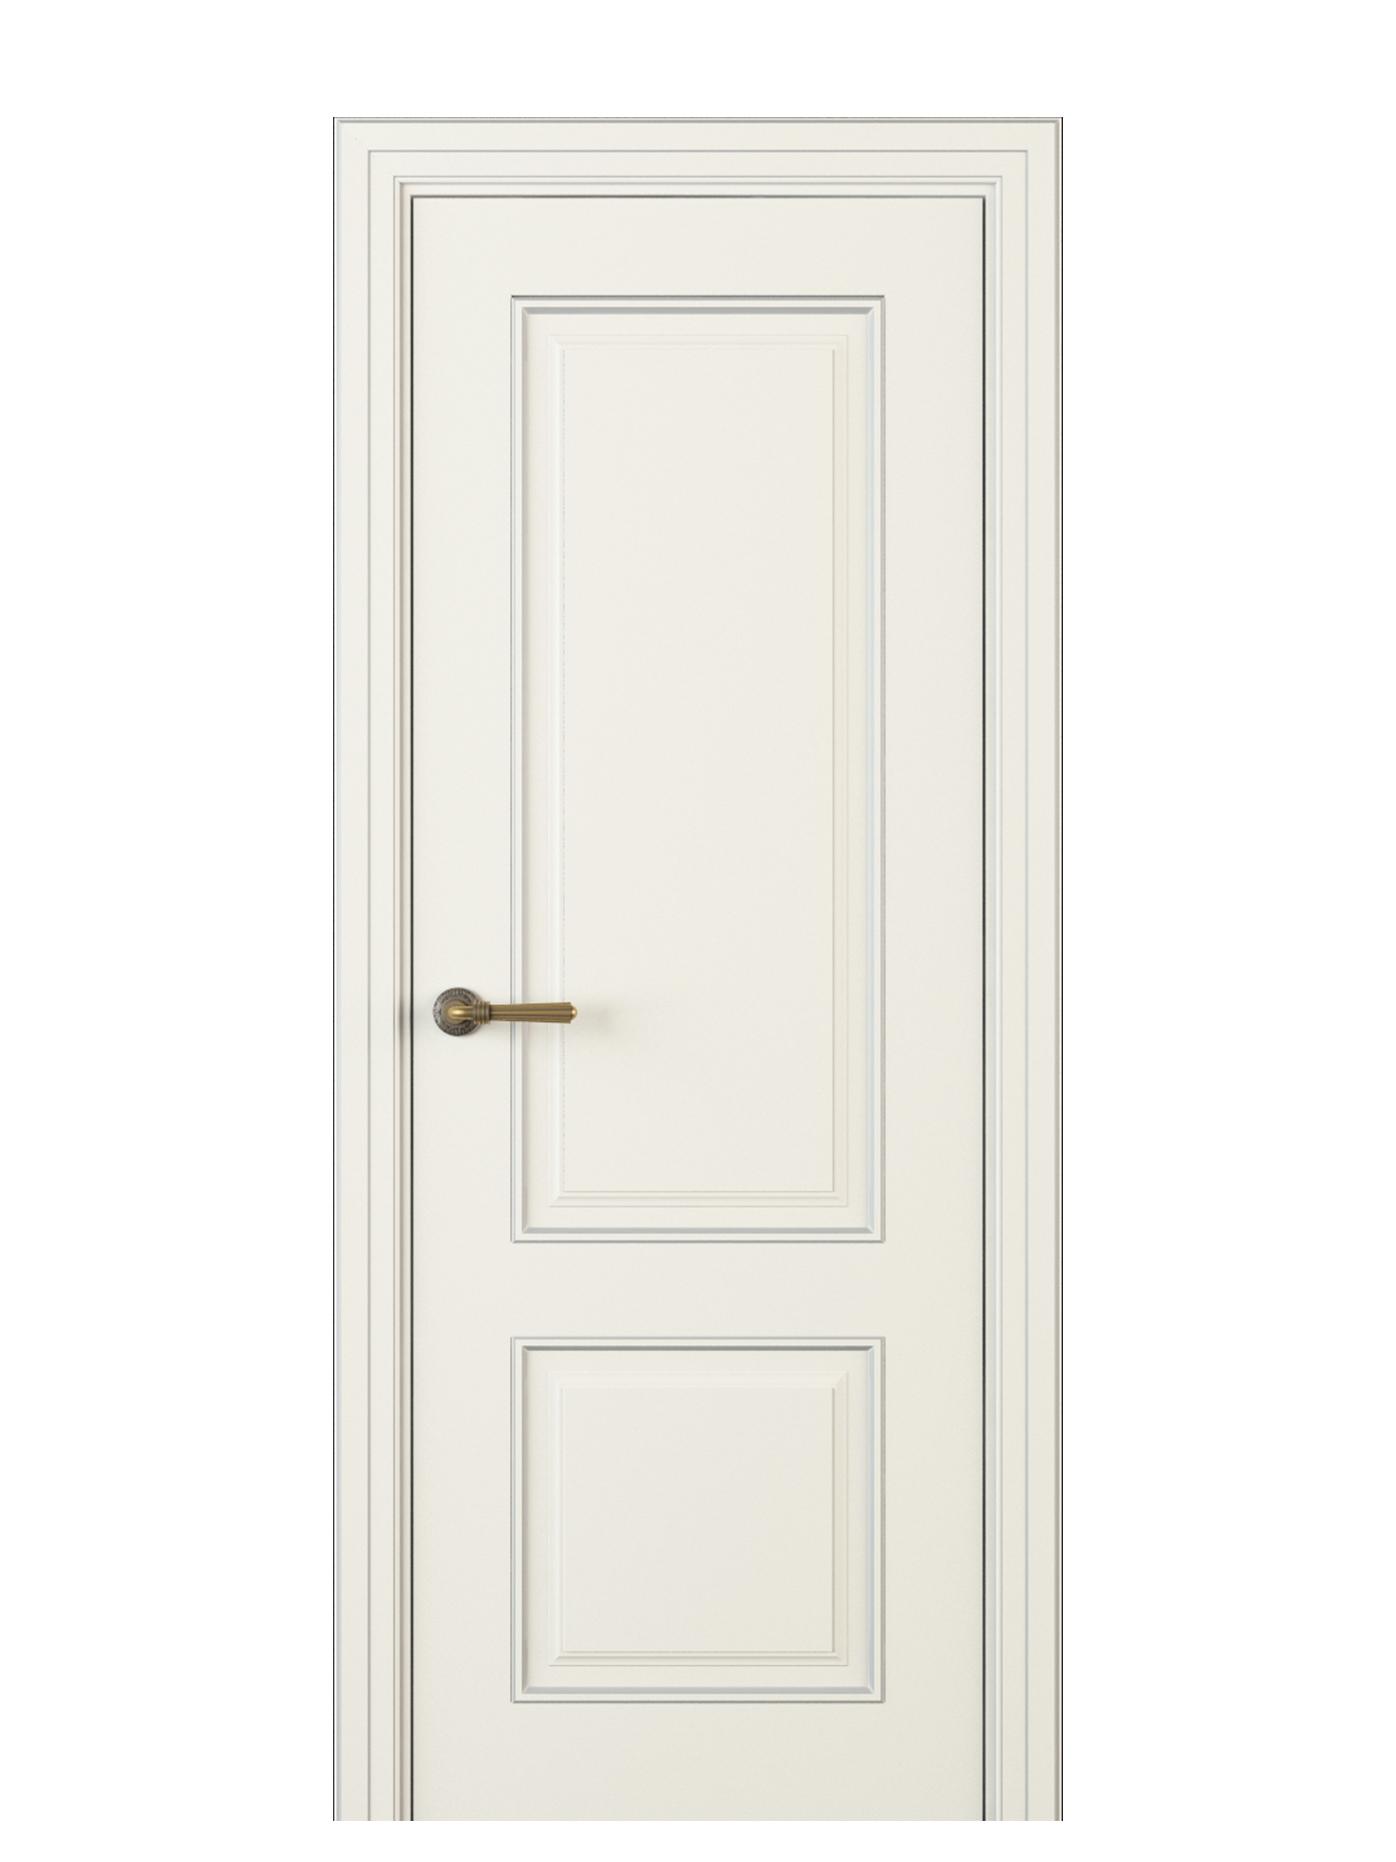 Image Donori Interior Door Italian Enamel 9010 0